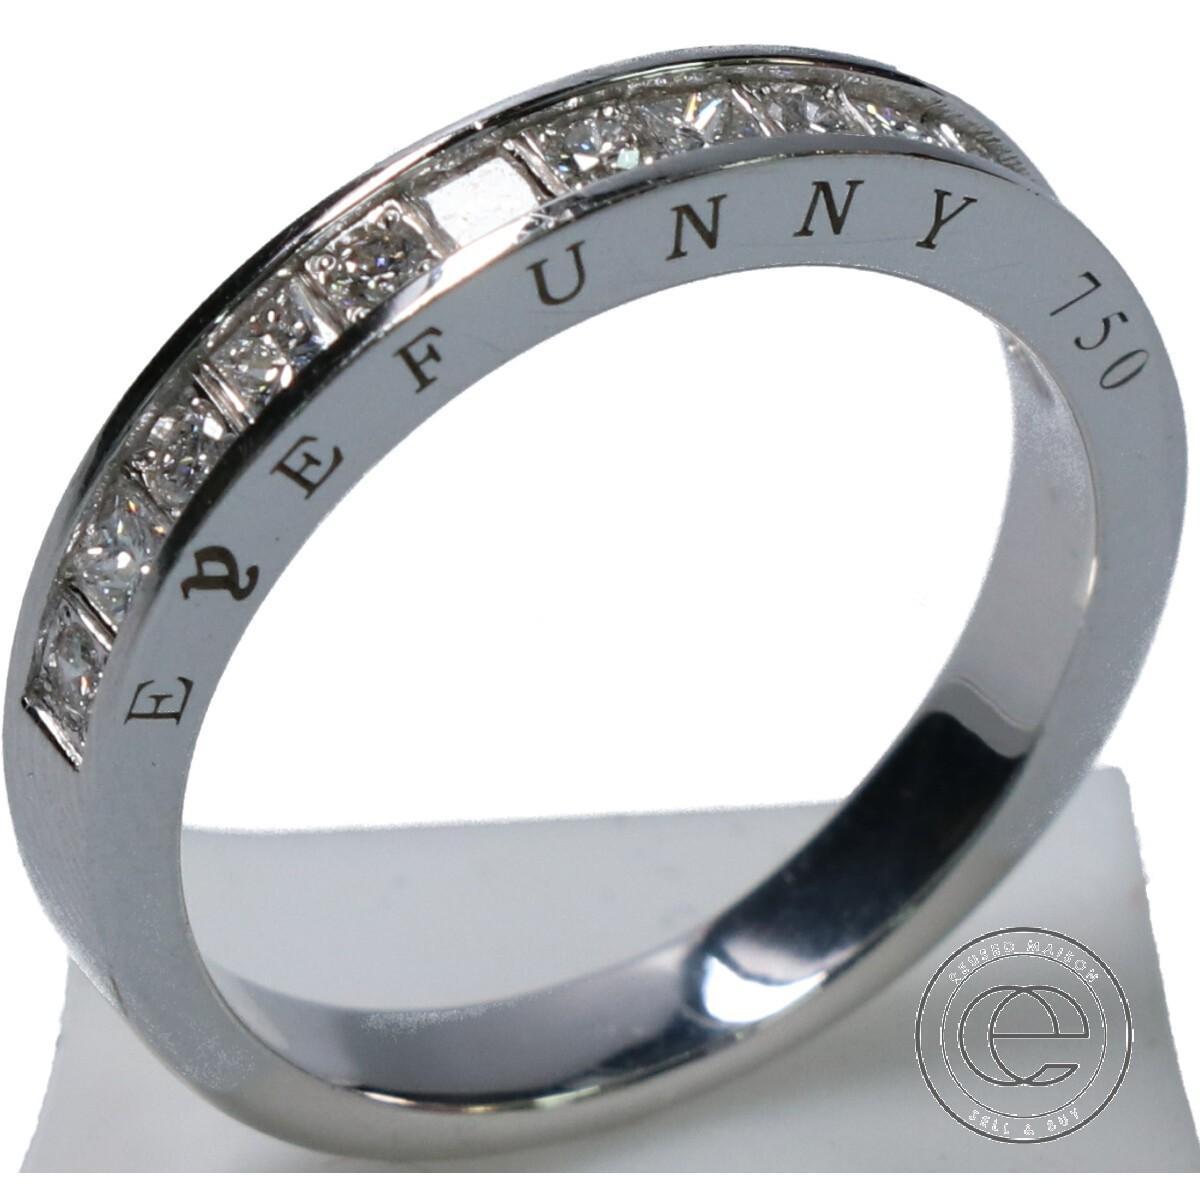 EYEFUNNY アイファニー RG003 18KWG 13Pダイヤモンド P&R リング 16号 指輪 ホワイトゴールド メンズ 【中古】